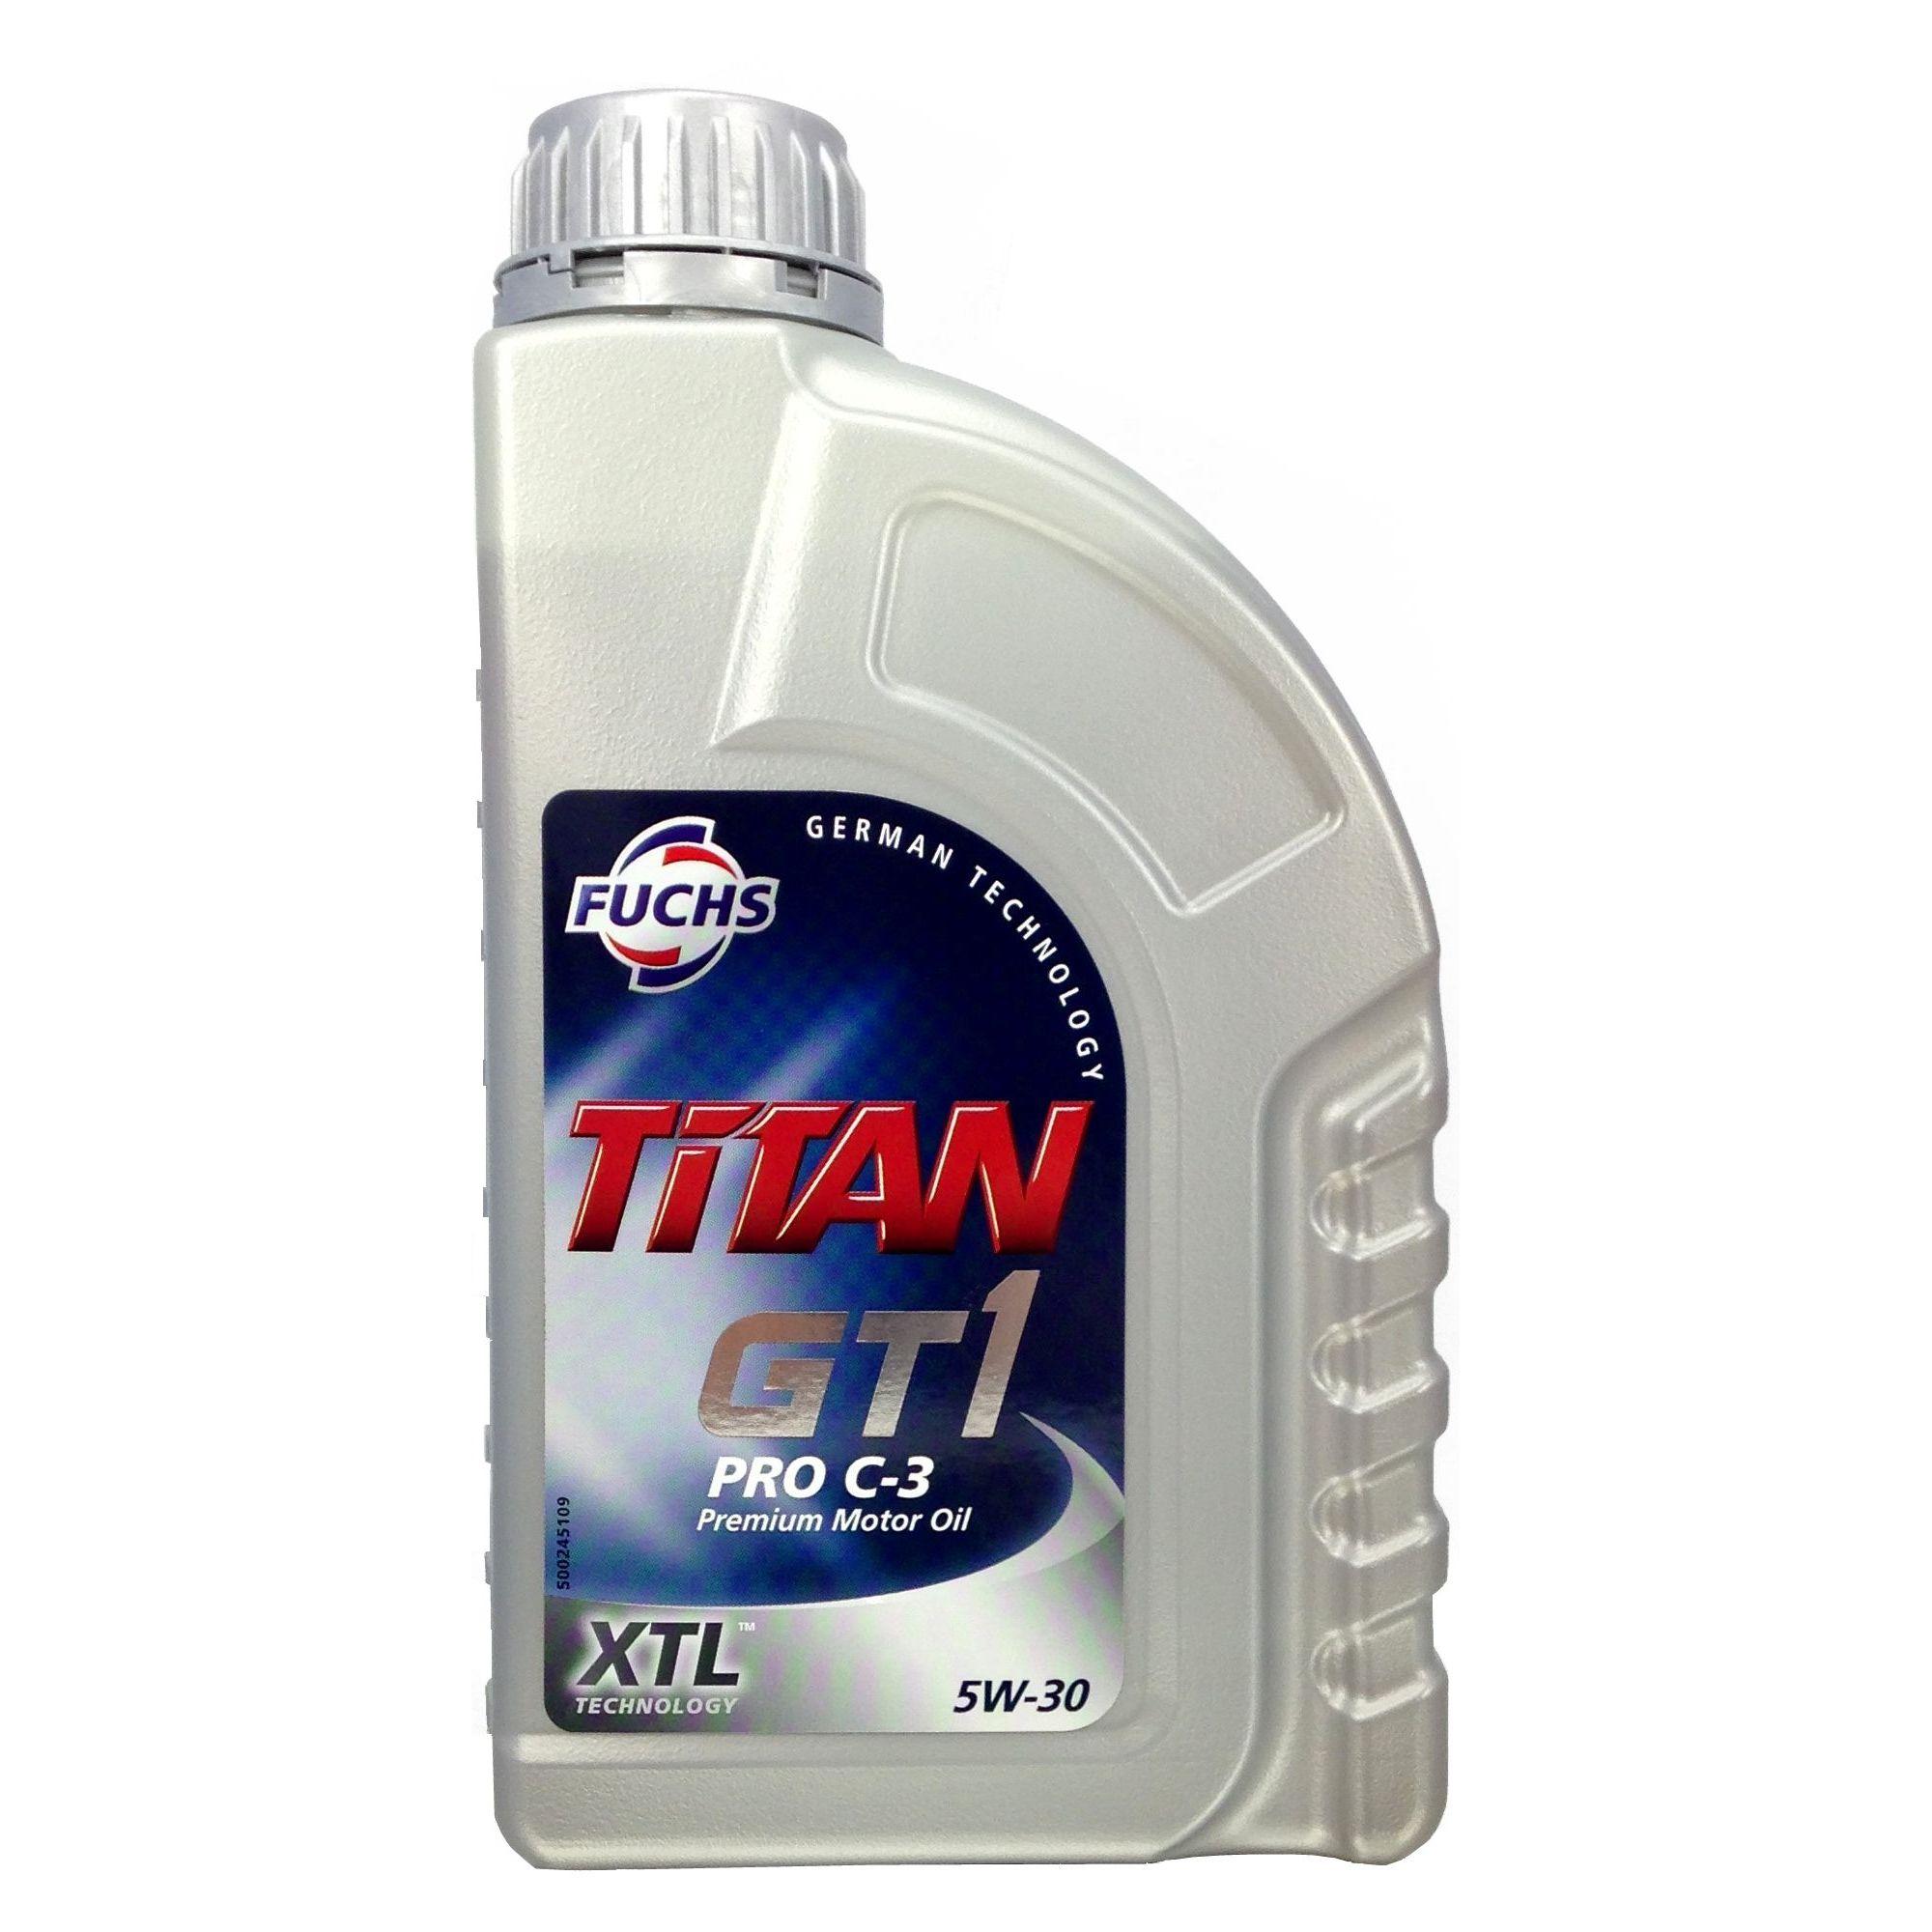 1 Liter FUCHS TITAN GT1 PRO C-3 SAE 5W-30